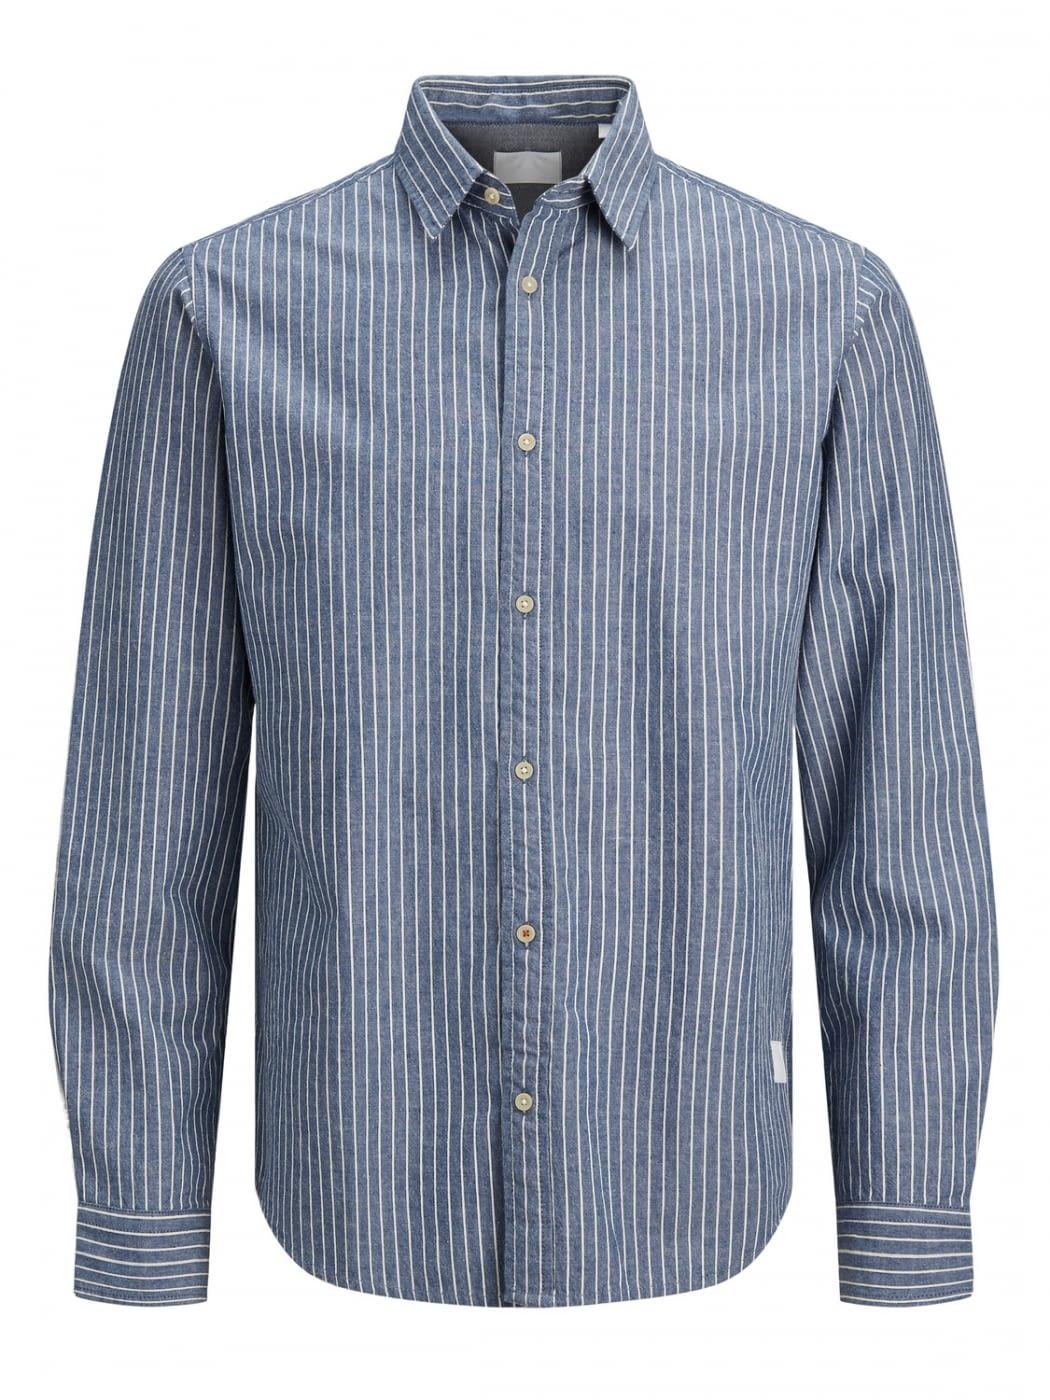 JJ30CLASSIC camisa manga larga